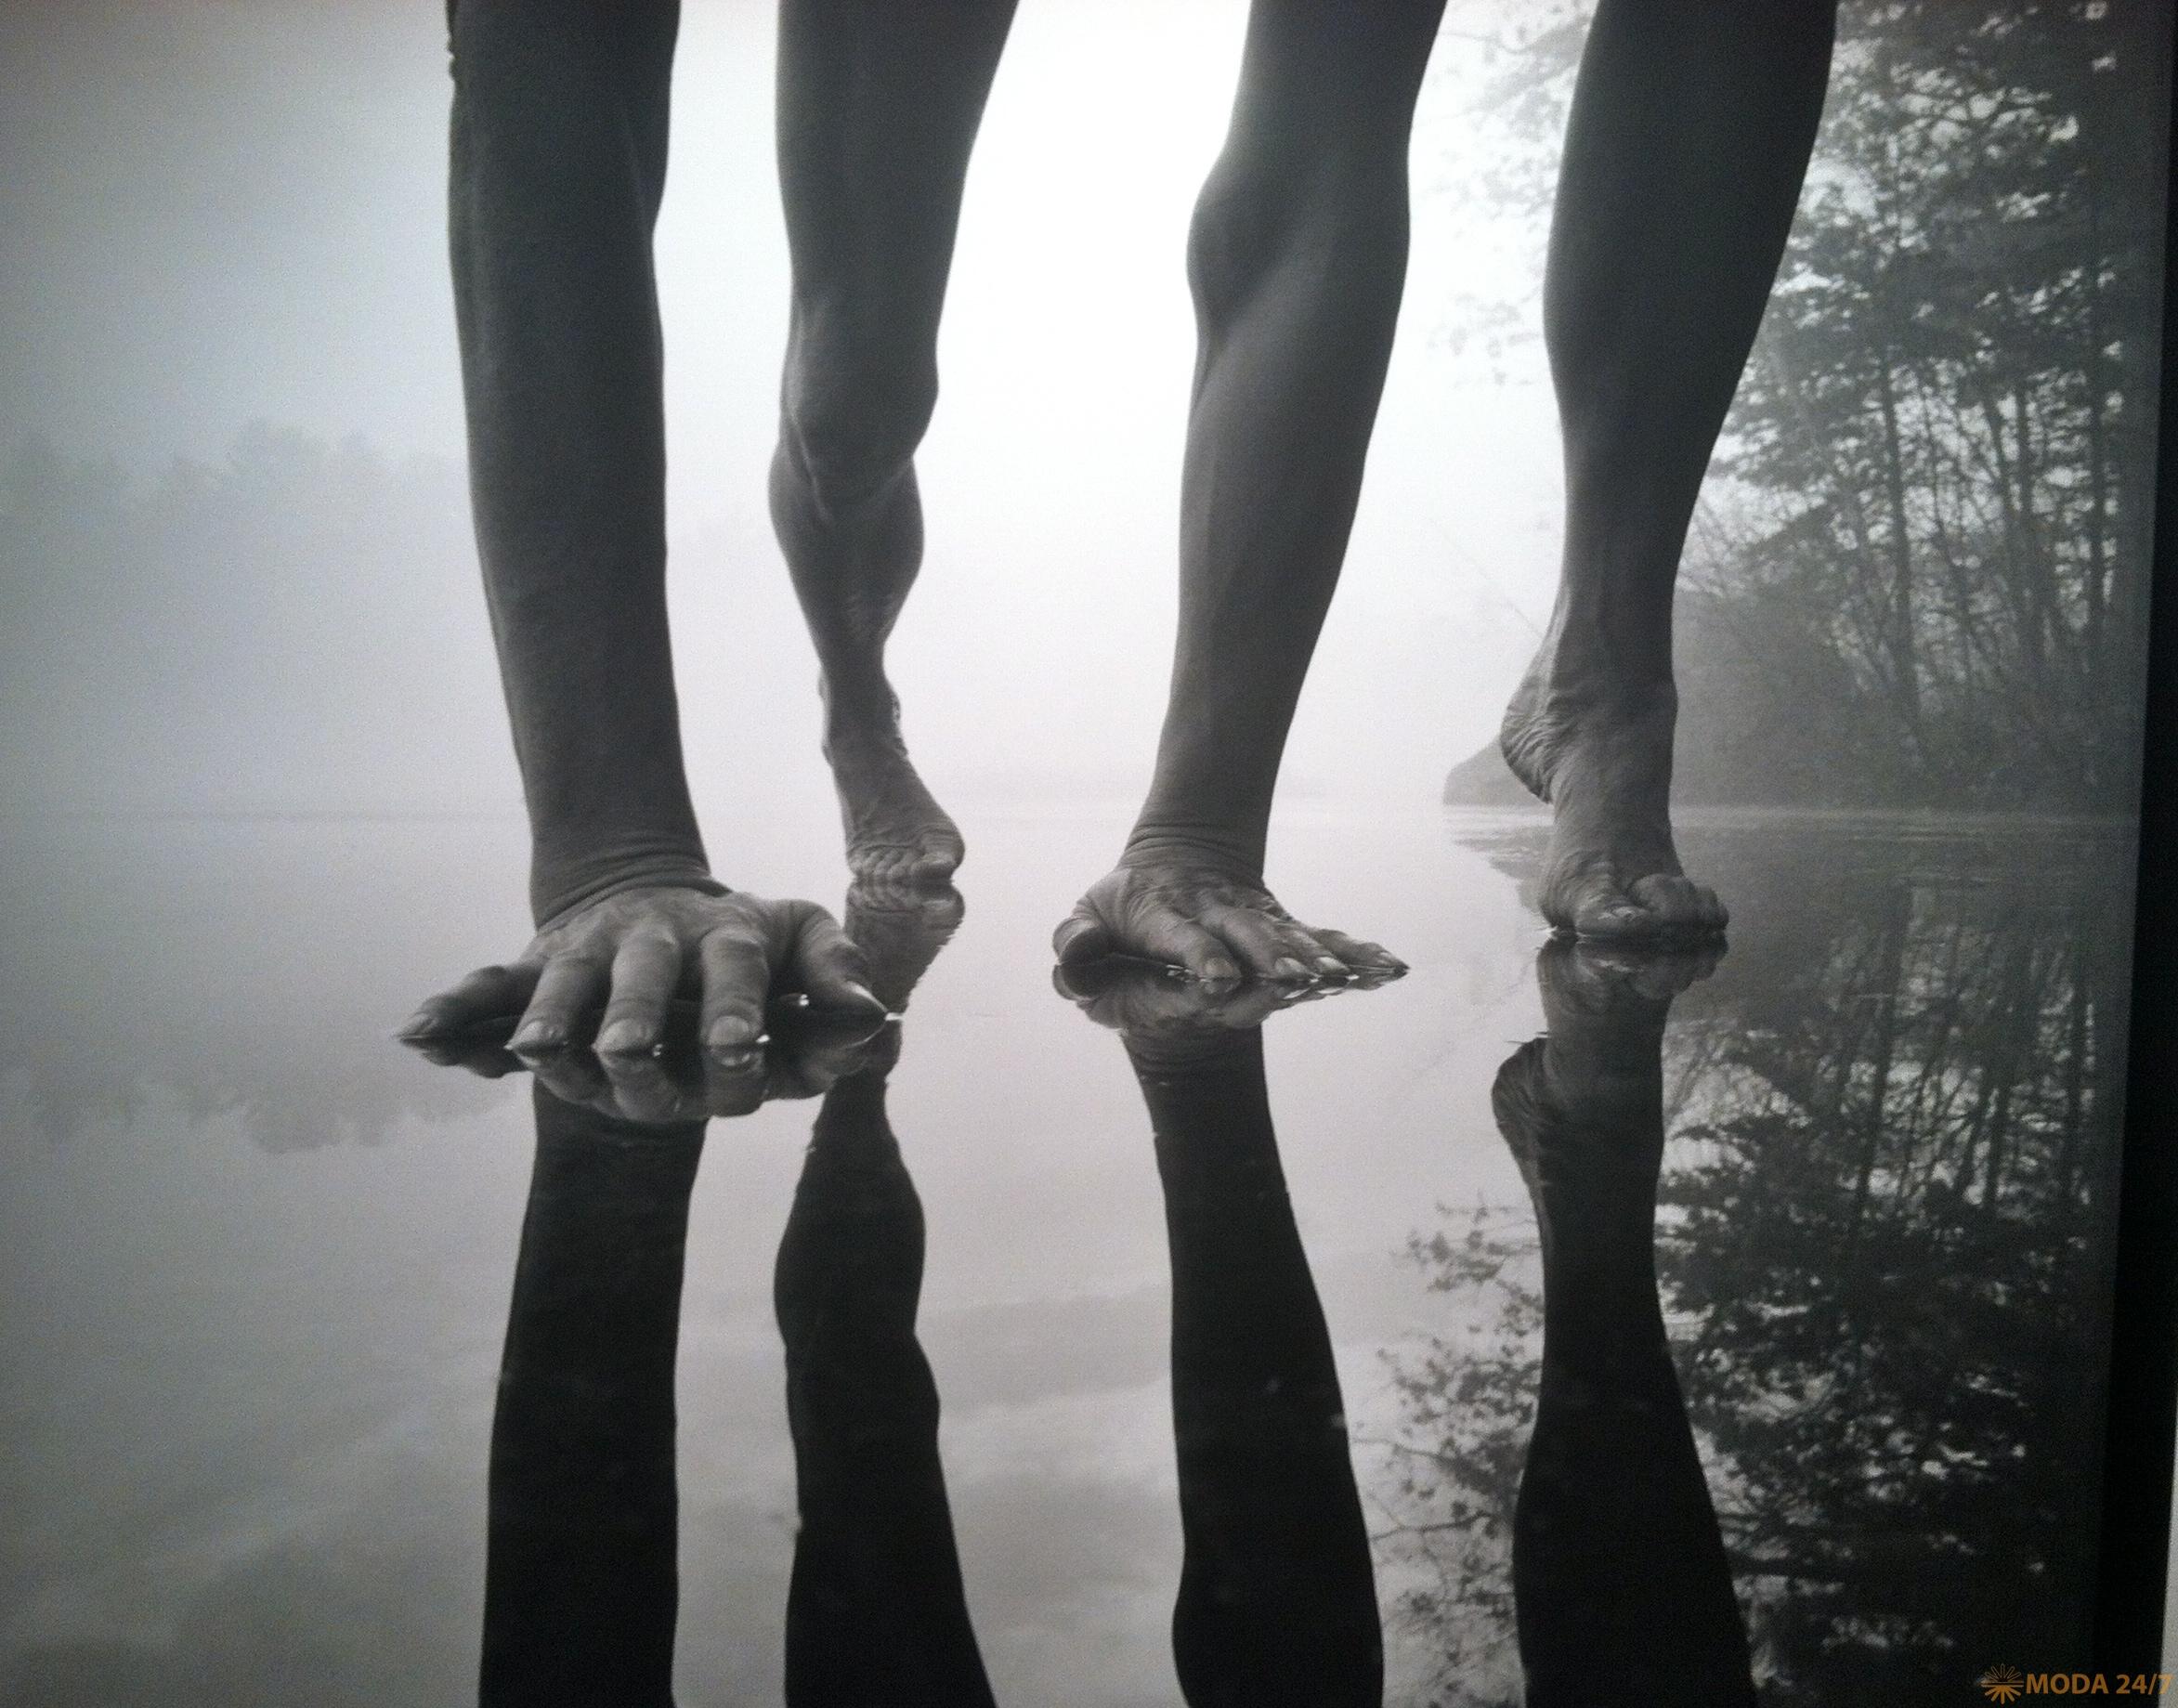 ©Arno Rafael Mikkinen. Fosters Pond, Millennium, Andover, Massachusetts. 2000. Моменты откровения Минккинена